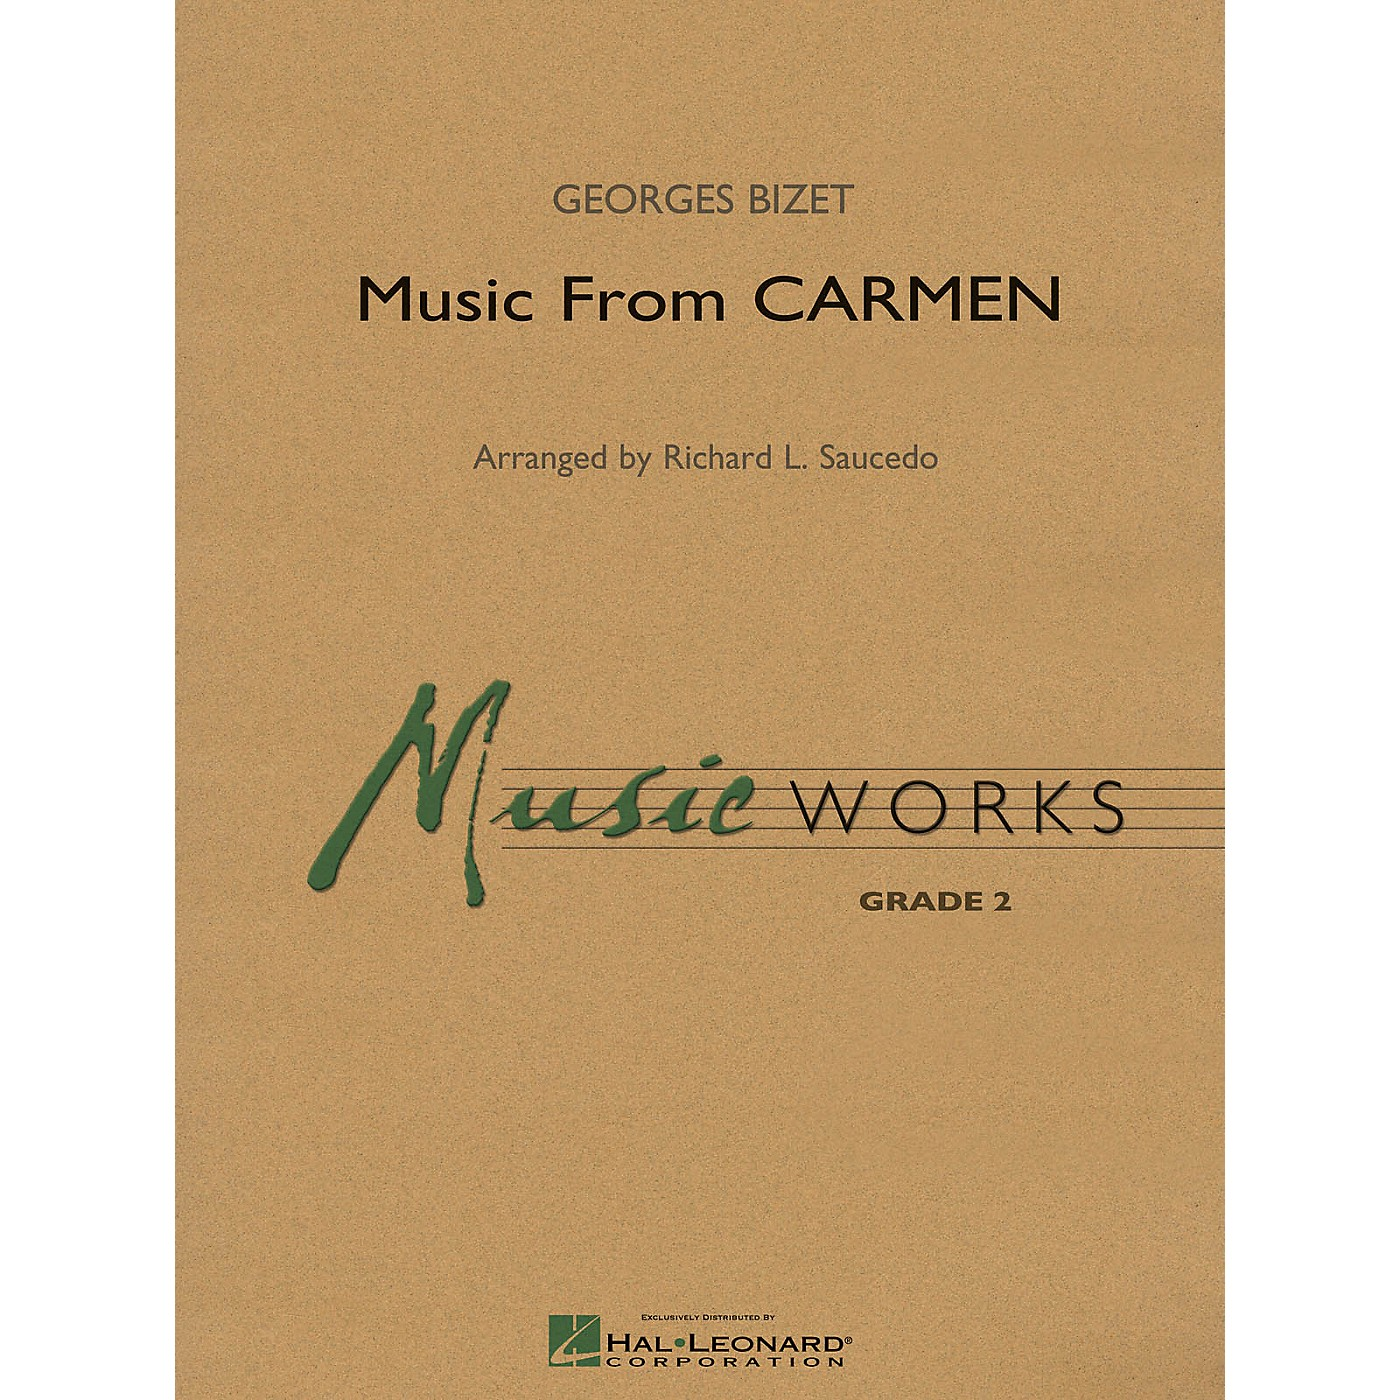 Hal Leonard Music from Carmen Concert Band Level 2 Arranged by Richard Saucedo thumbnail